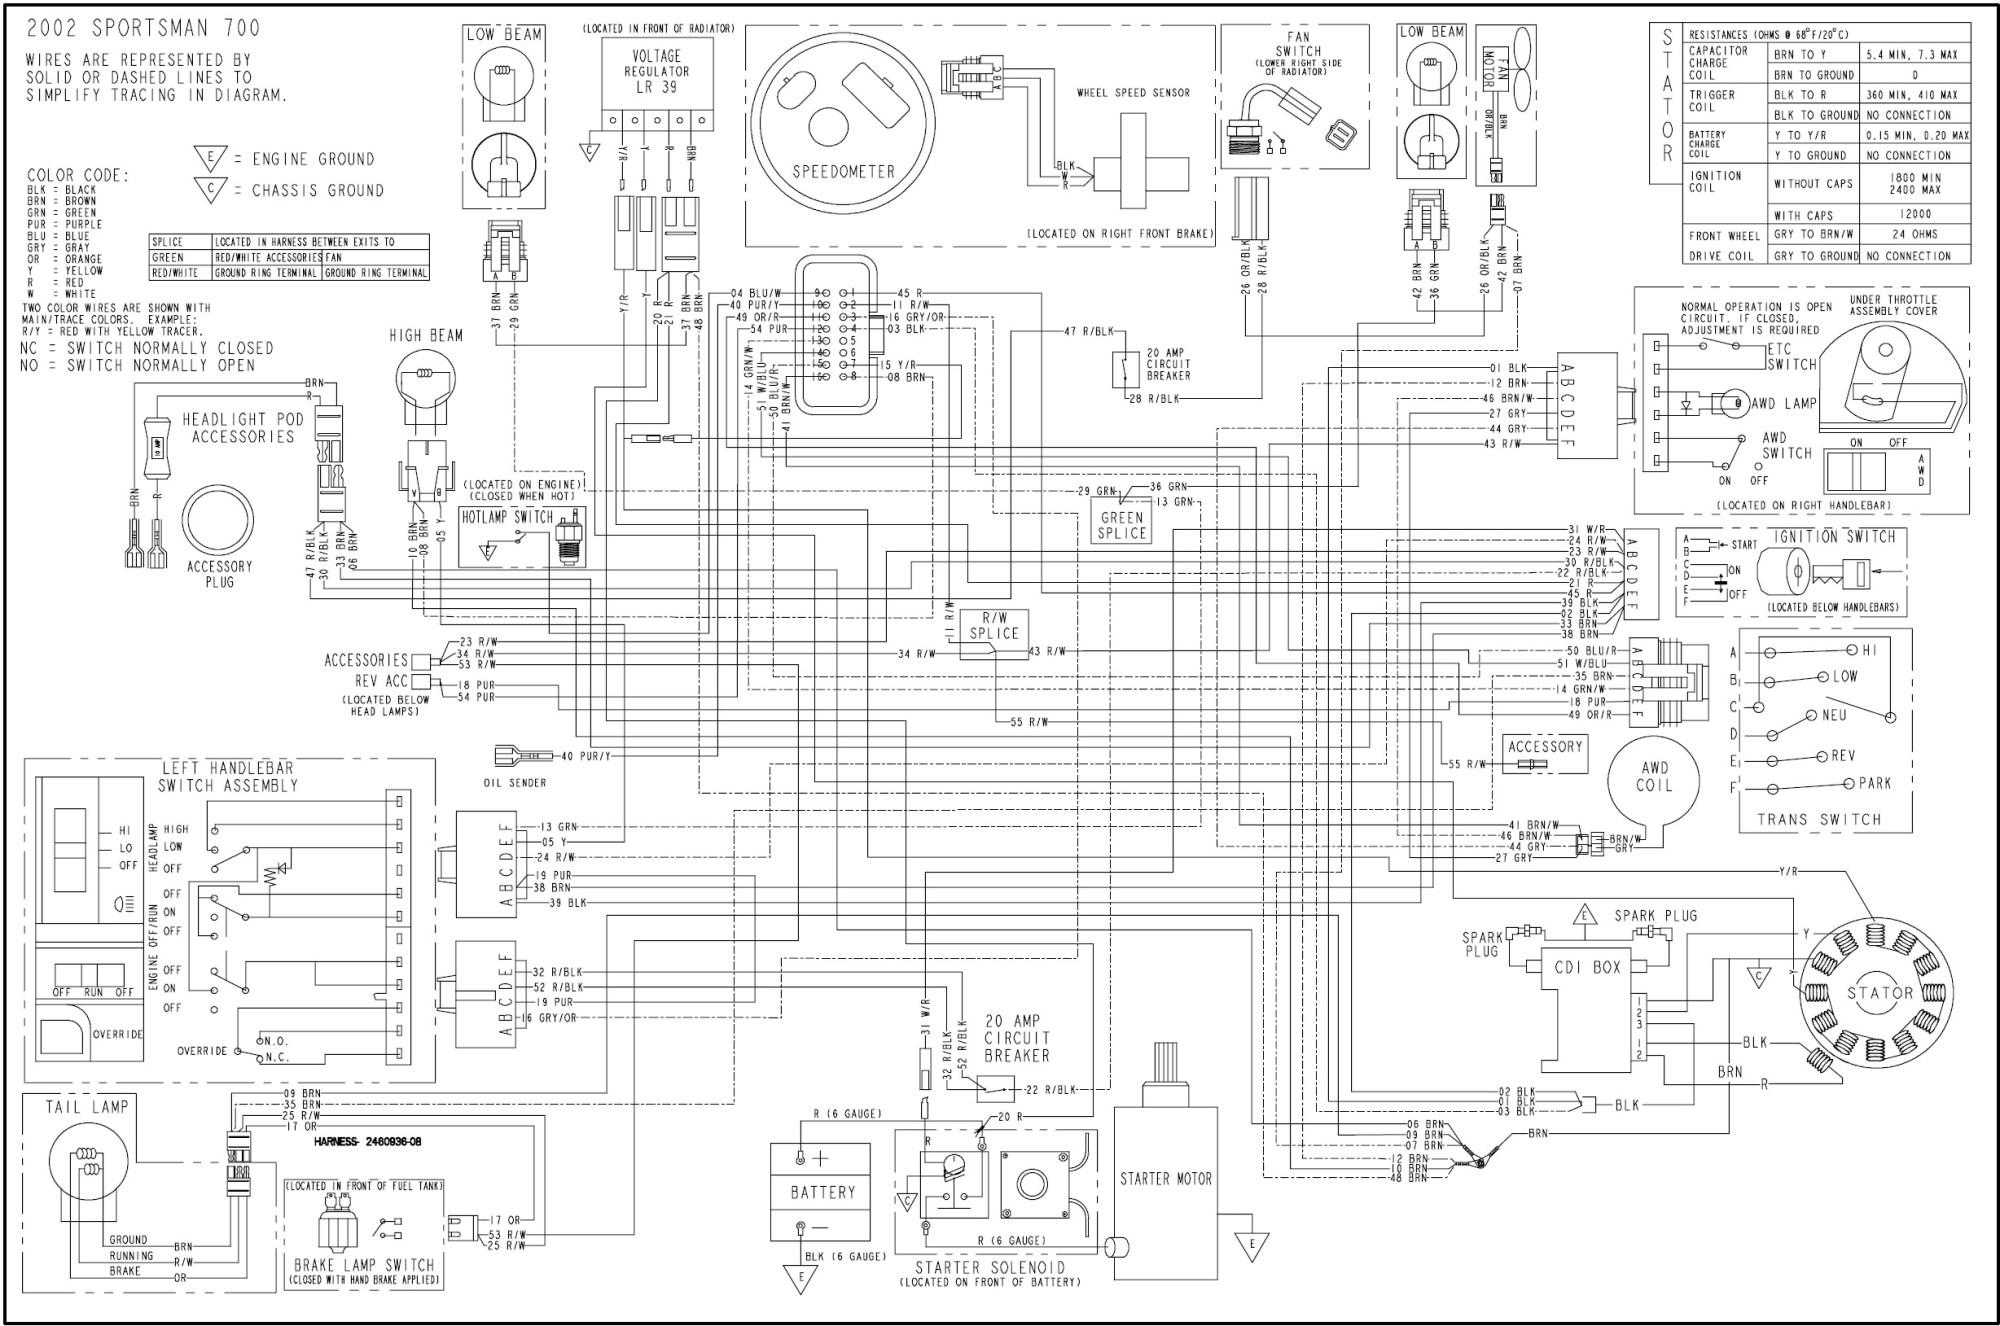 hight resolution of 2003 600 sportsman no spark polaris atv forum 2006 polaris sportsman 600 wiring diagram polaris sportsman 600 wiring diagram